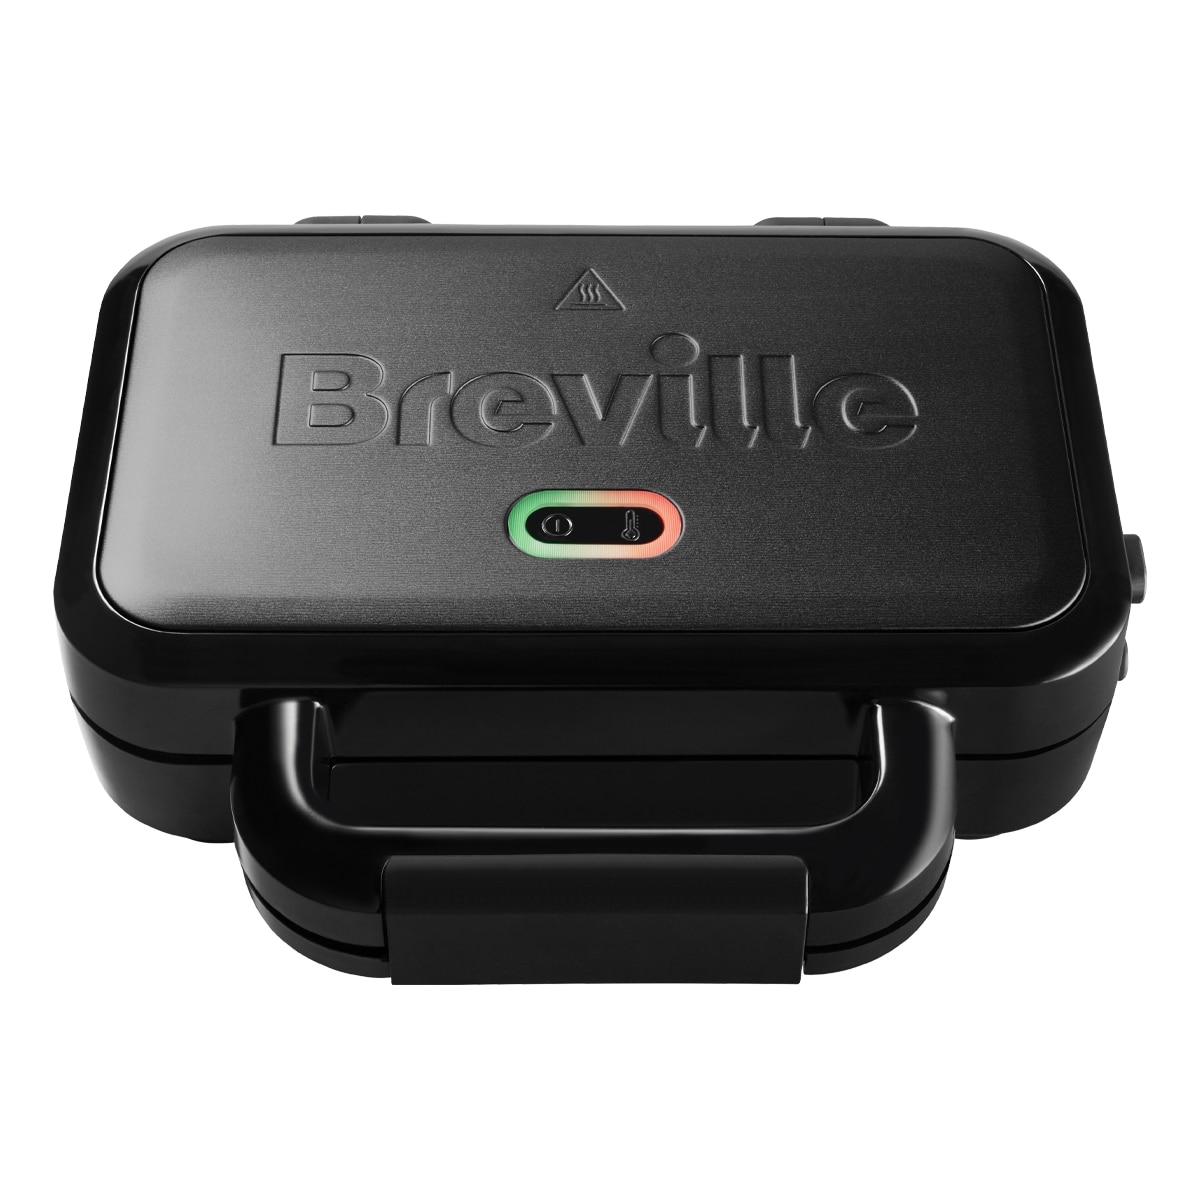 Fotografie Sandwich-maker Breville VST082X-01, 850 W, Extra Deep Fill Breville